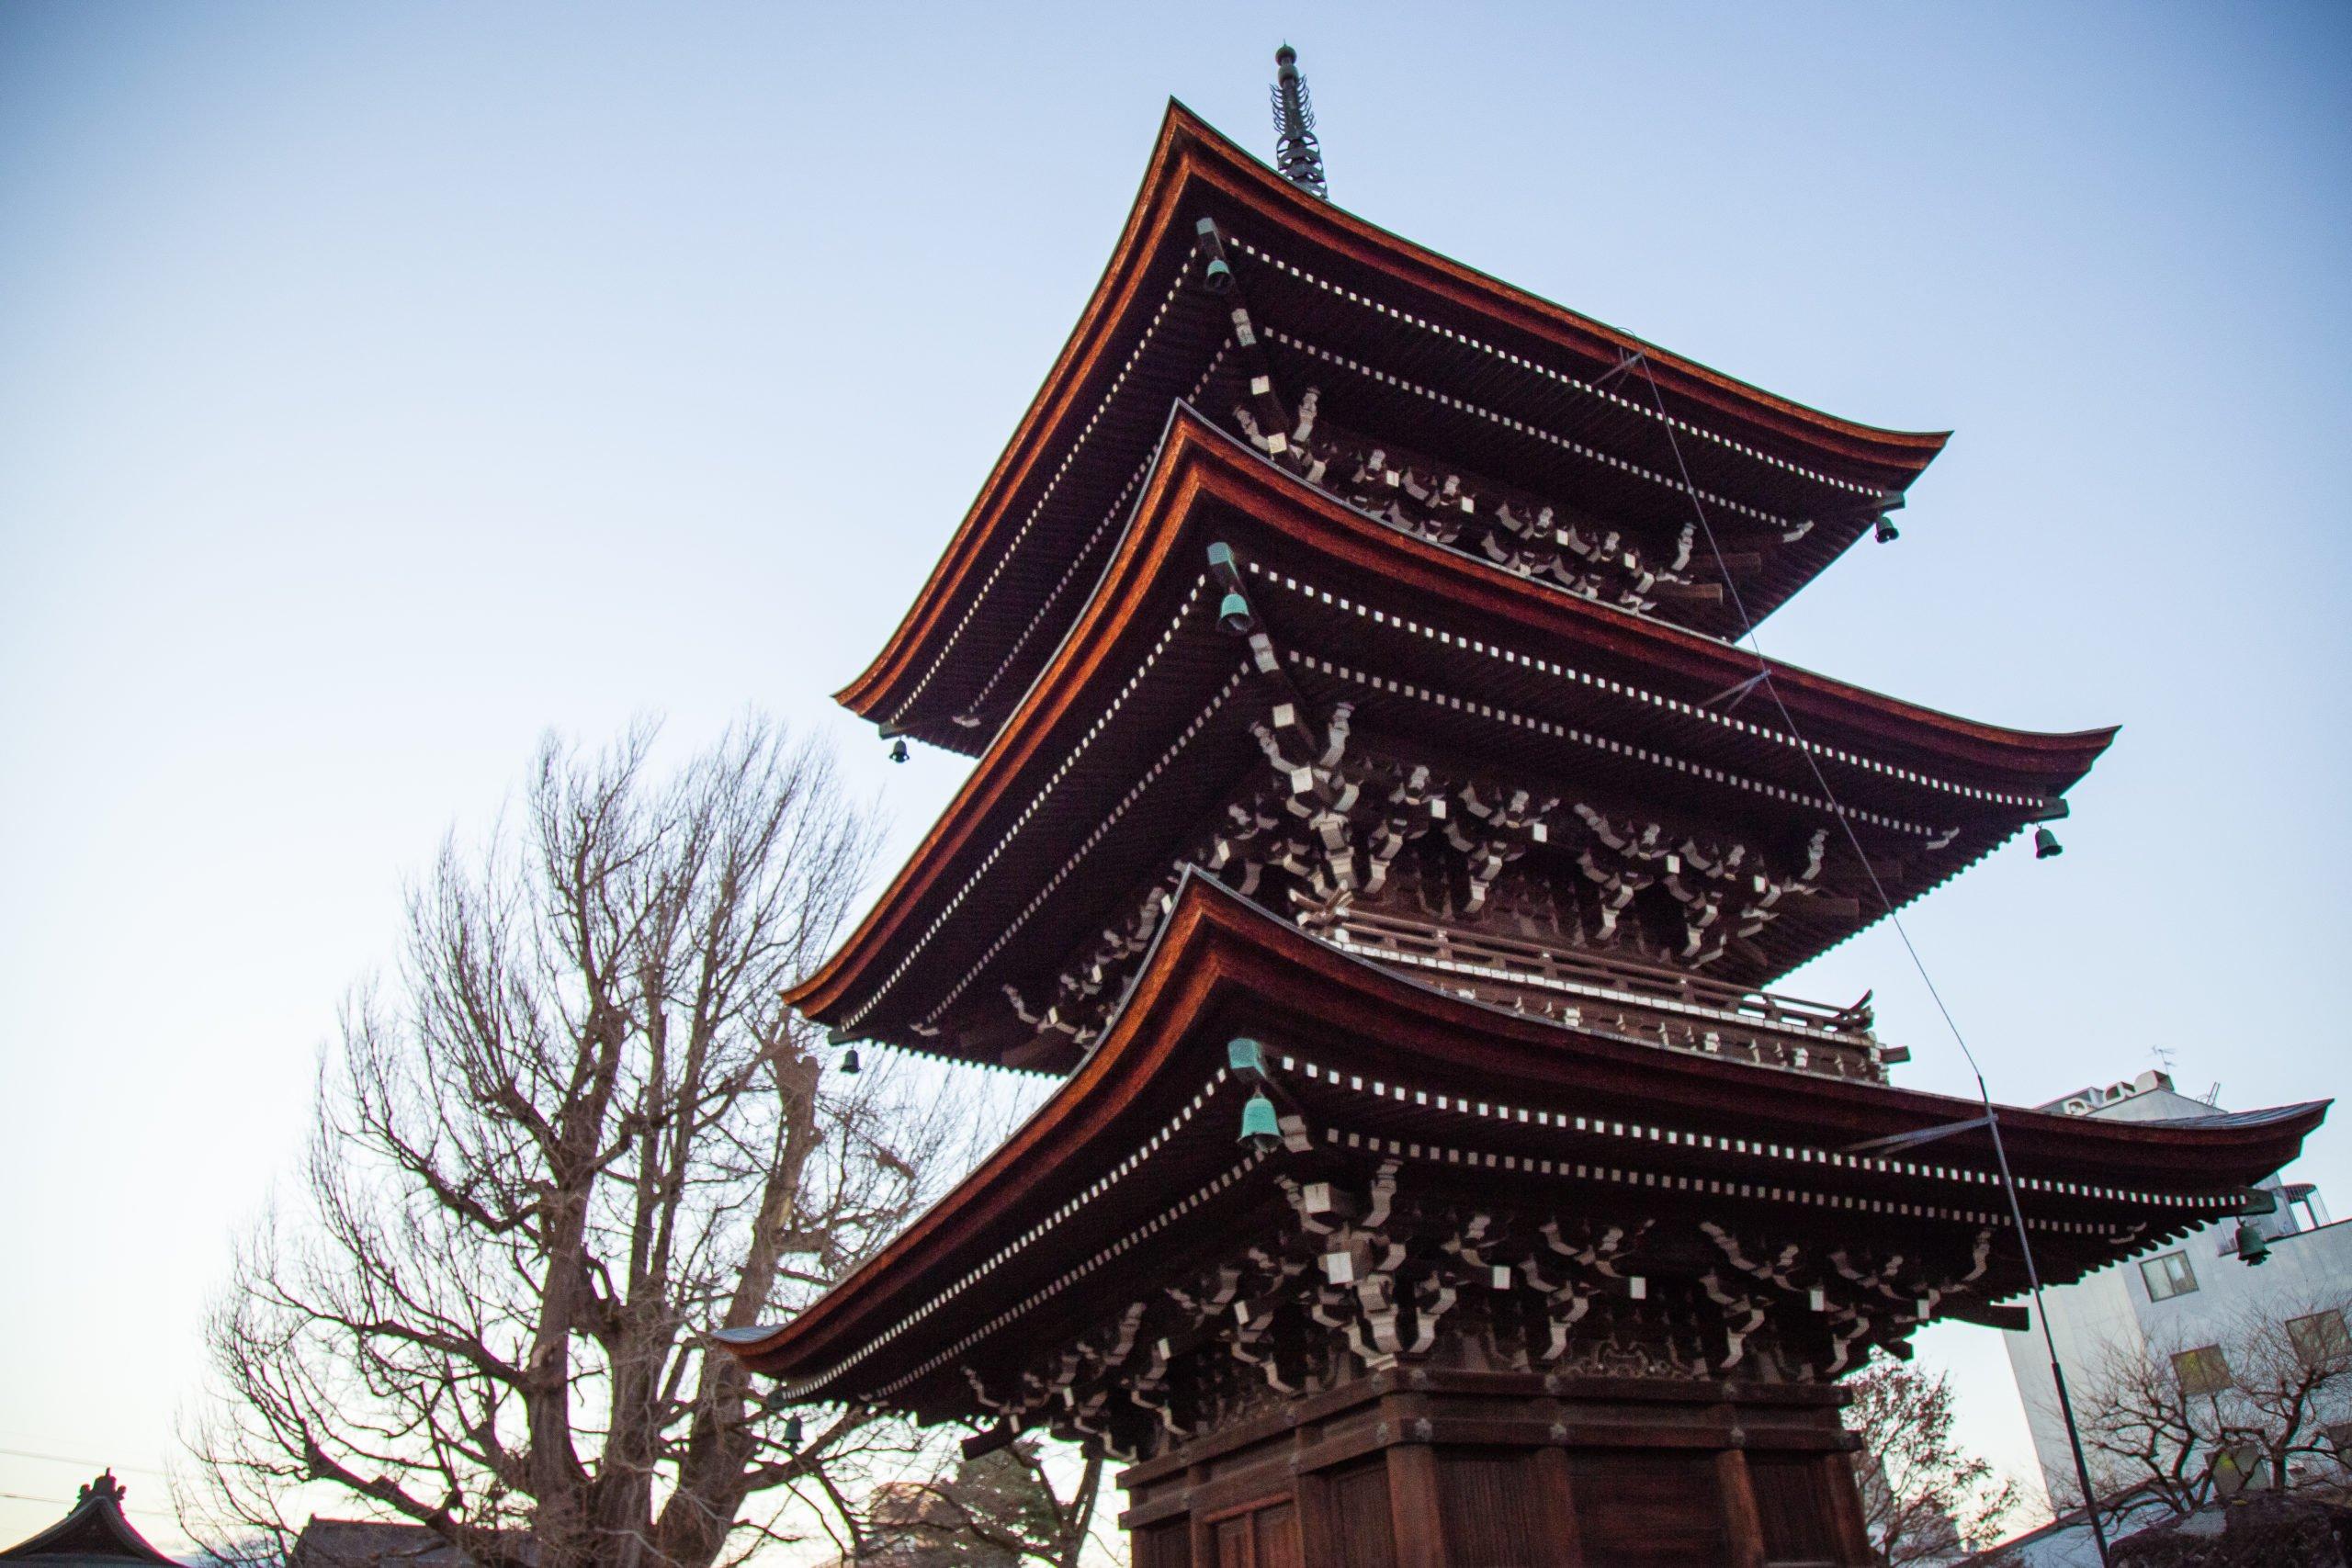 Learn About Takayamas History On The Takayama Food And Sake Tasting Tour